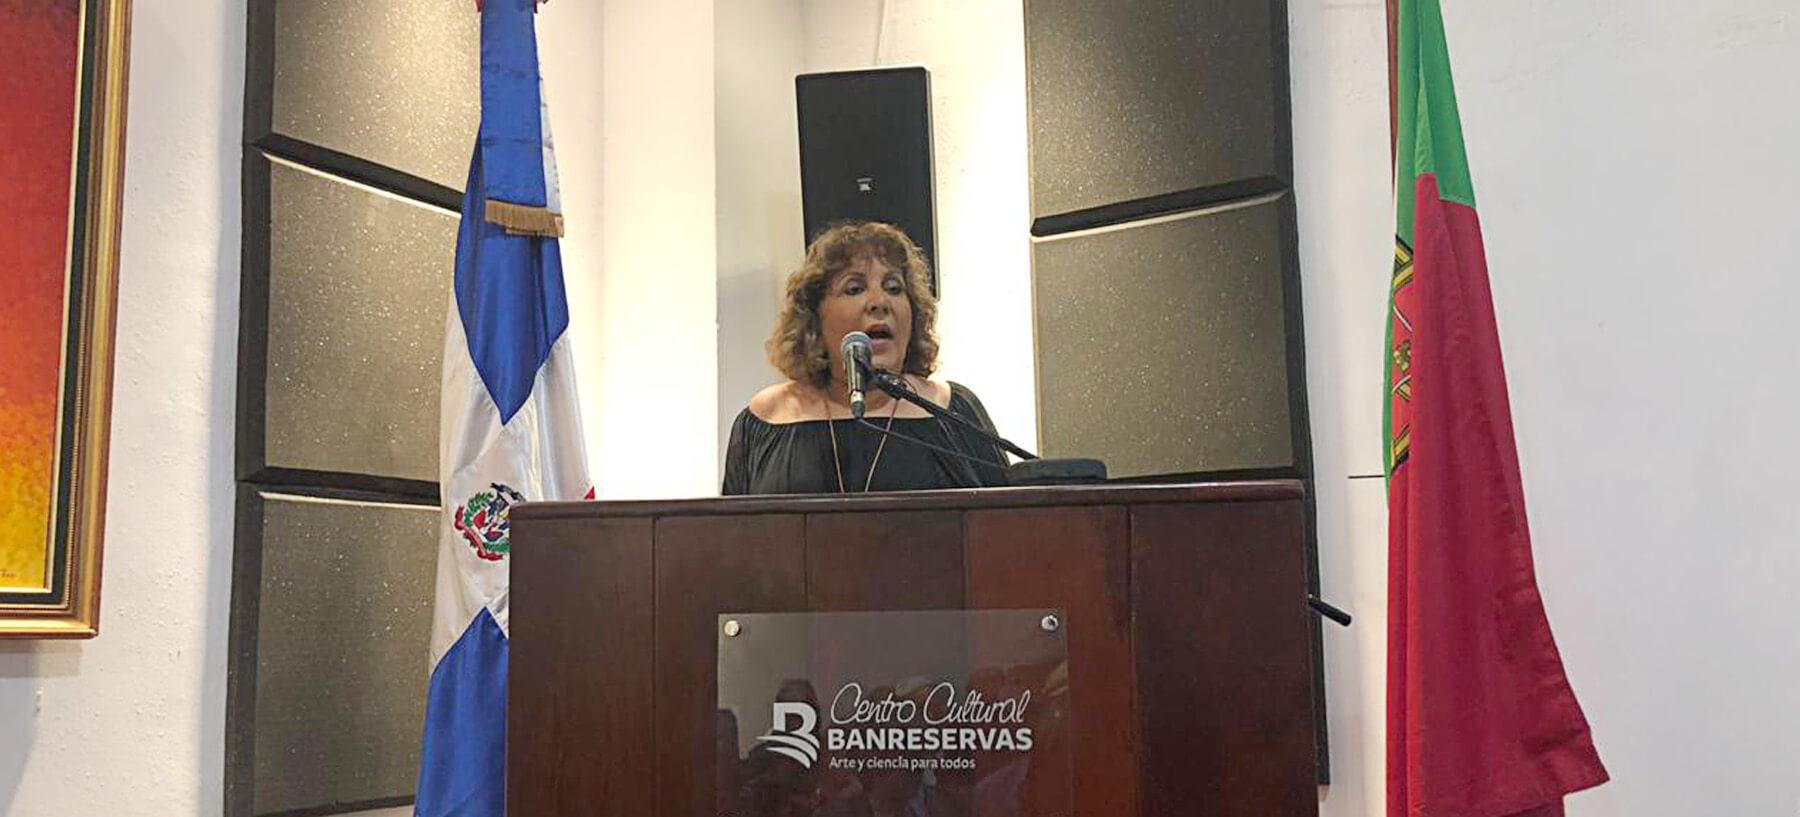 Portugal Inaugura Muestra En Centro Cultural Banreservas